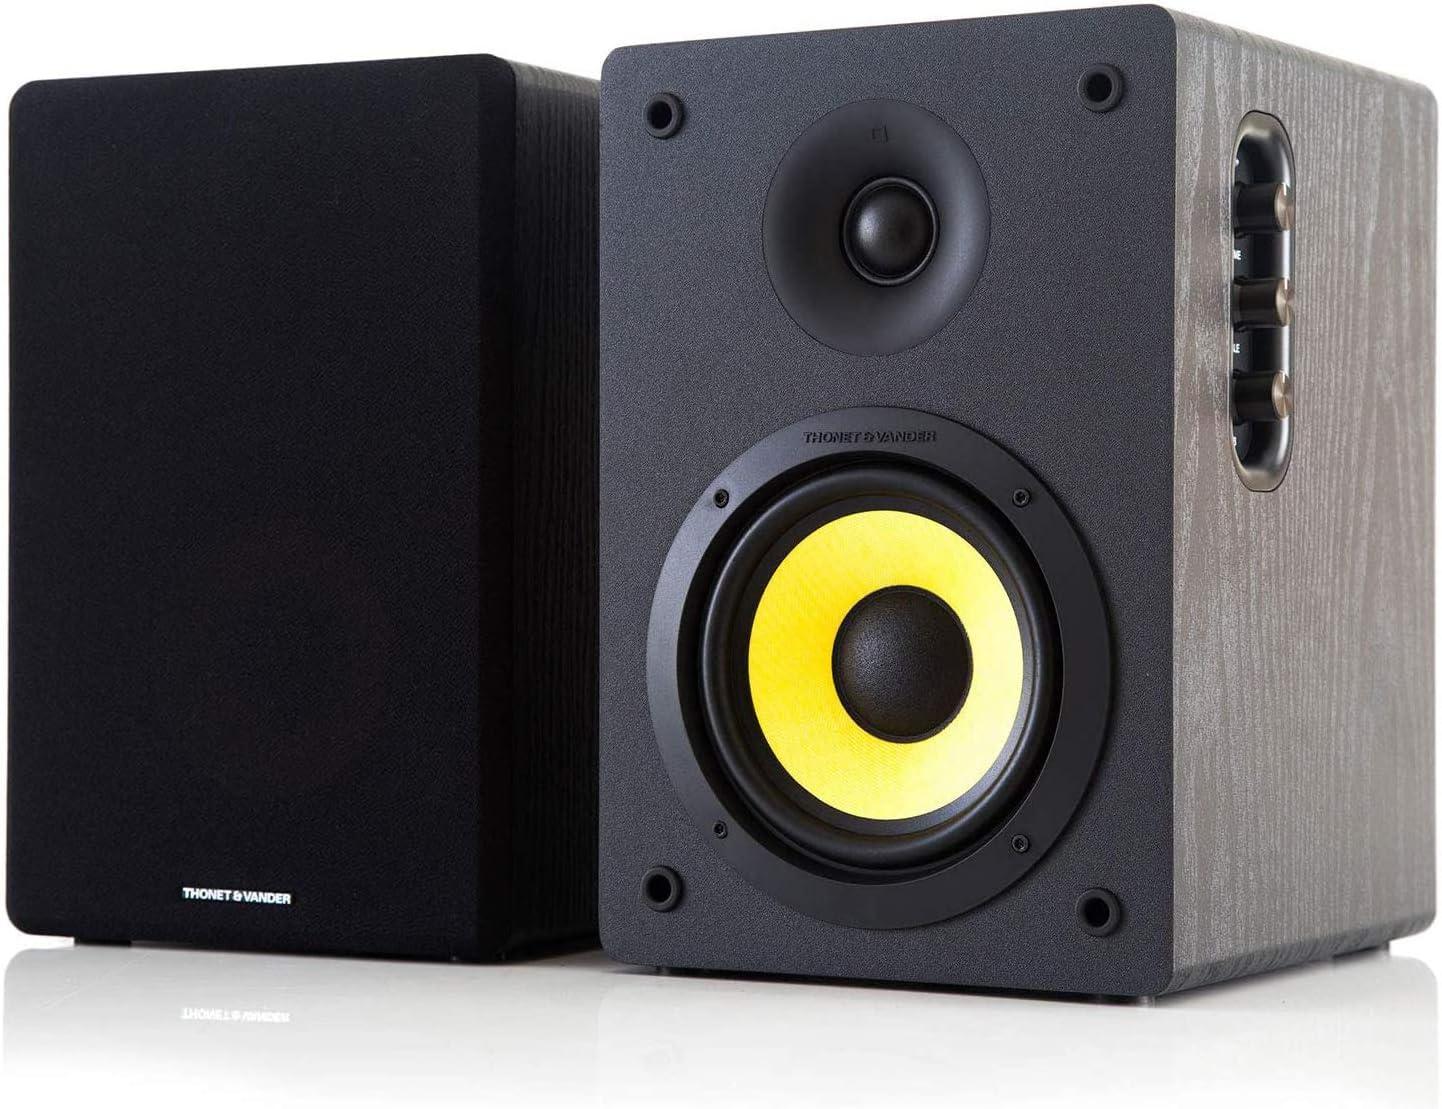 Altavoces Thonet /& Vander Kurbis BT HK09603556 Universal, De 2 v/ías, Piso, Mesa//estante, 60 W, 50-20000 Hz, 6 Ohmio